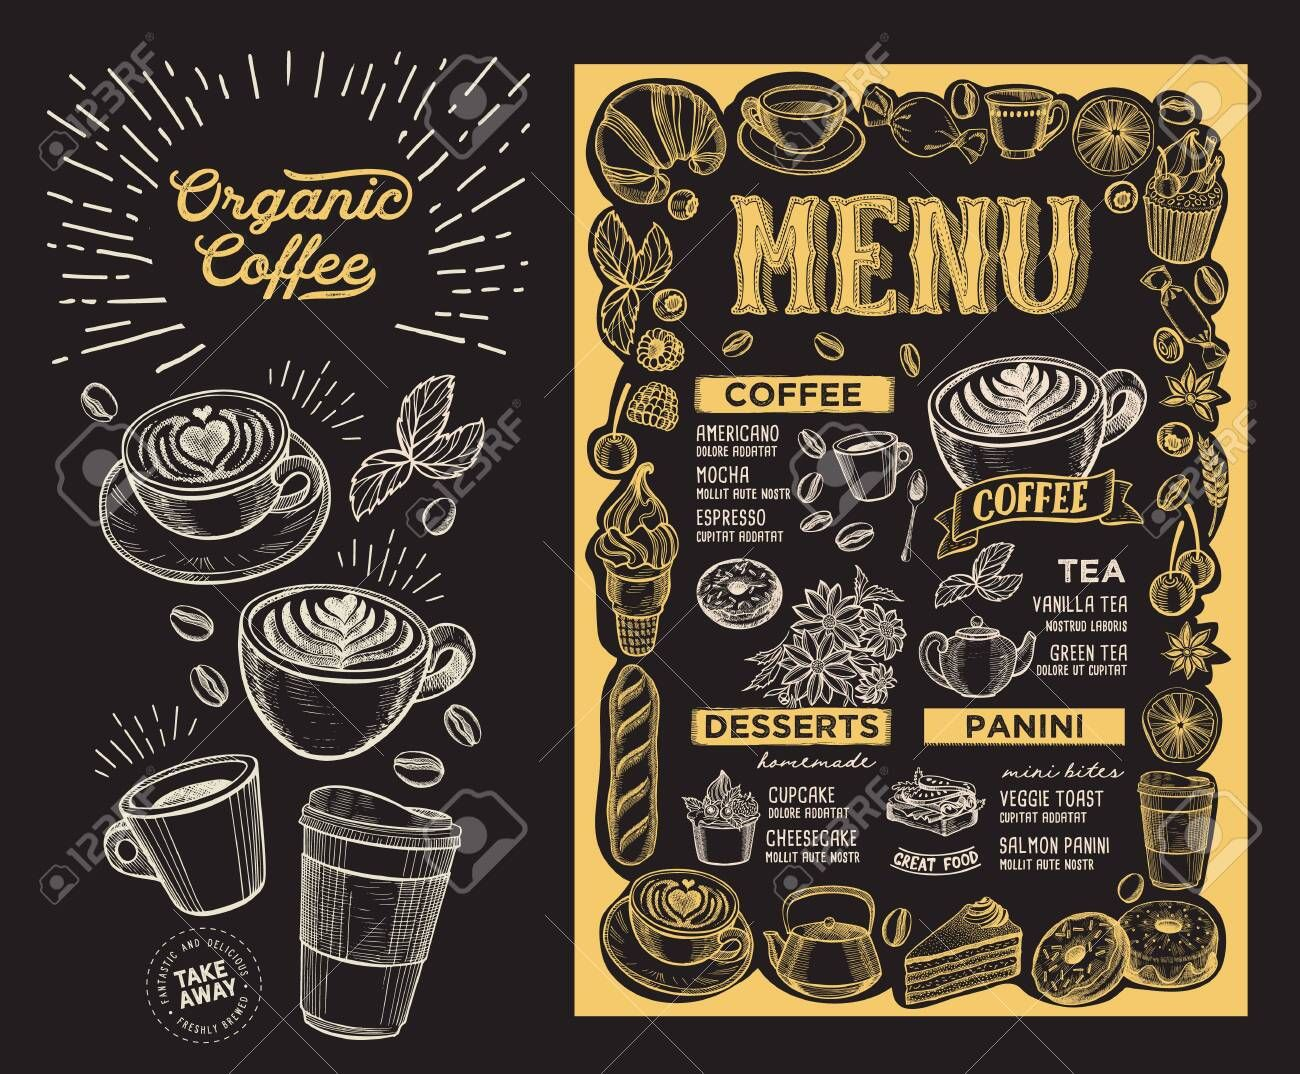 Coffee Menu Template For Restaurant On A Blackboard Background Illustration Brochure For Food And Drink Cafe Desi Coffee Menu Menu Template Food Menu Template